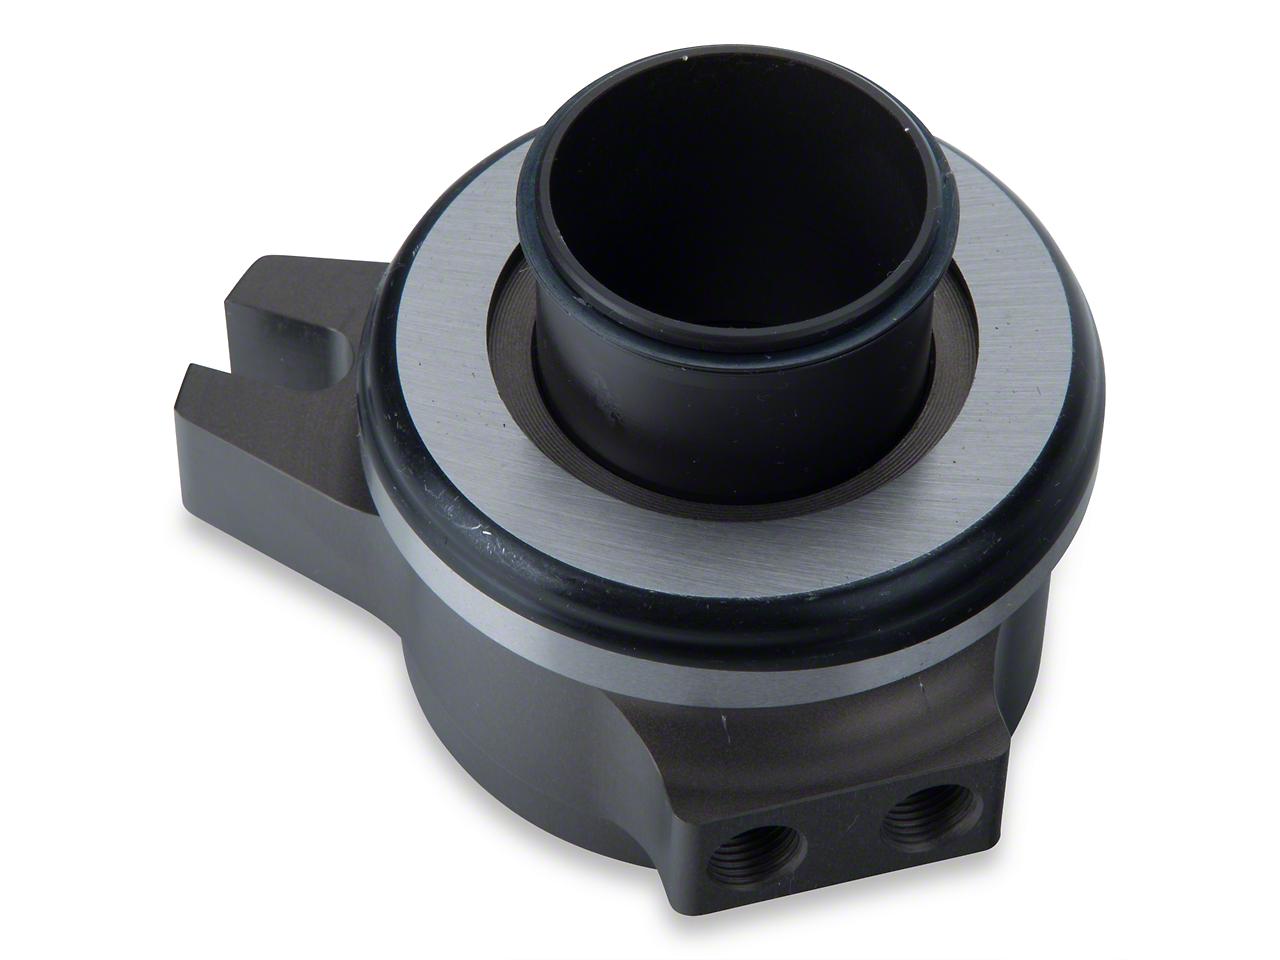 RAM Adjustable Hydraulic Throwout Bearing/Slave Cylinder (11-14 V6)